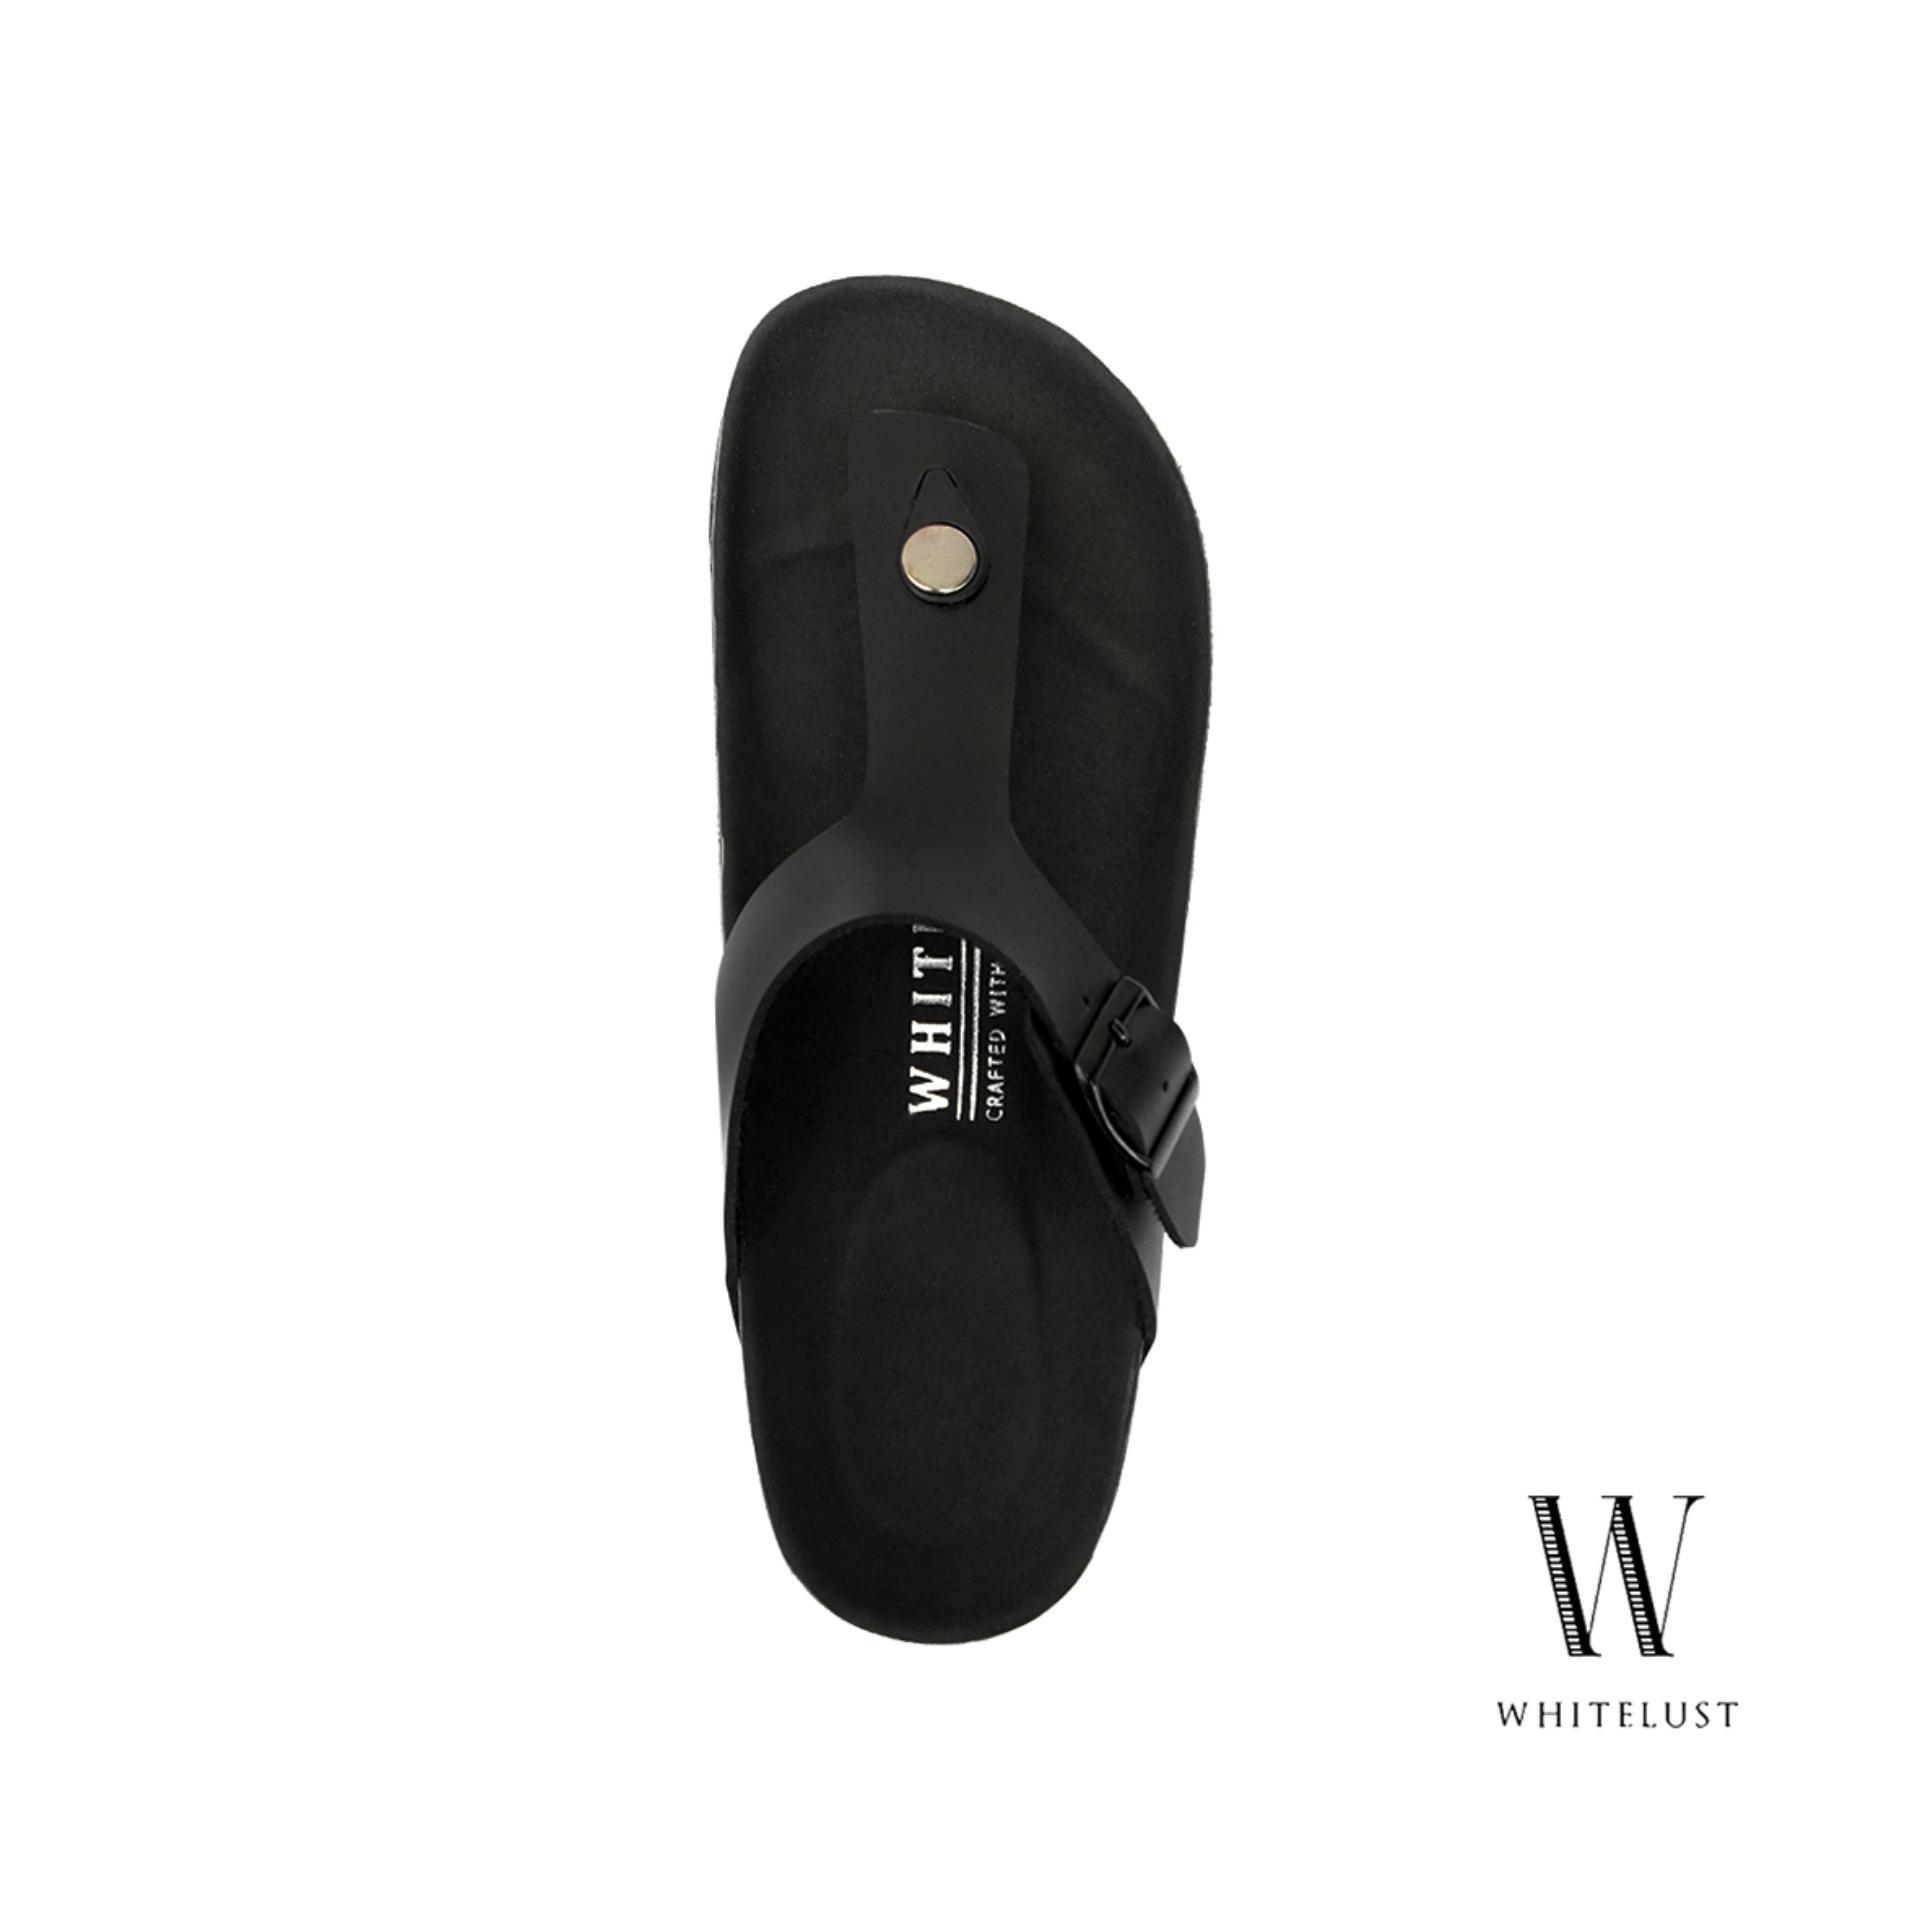 Harga Whitelust Saffron Flip Flop Sandal Yang Bagus